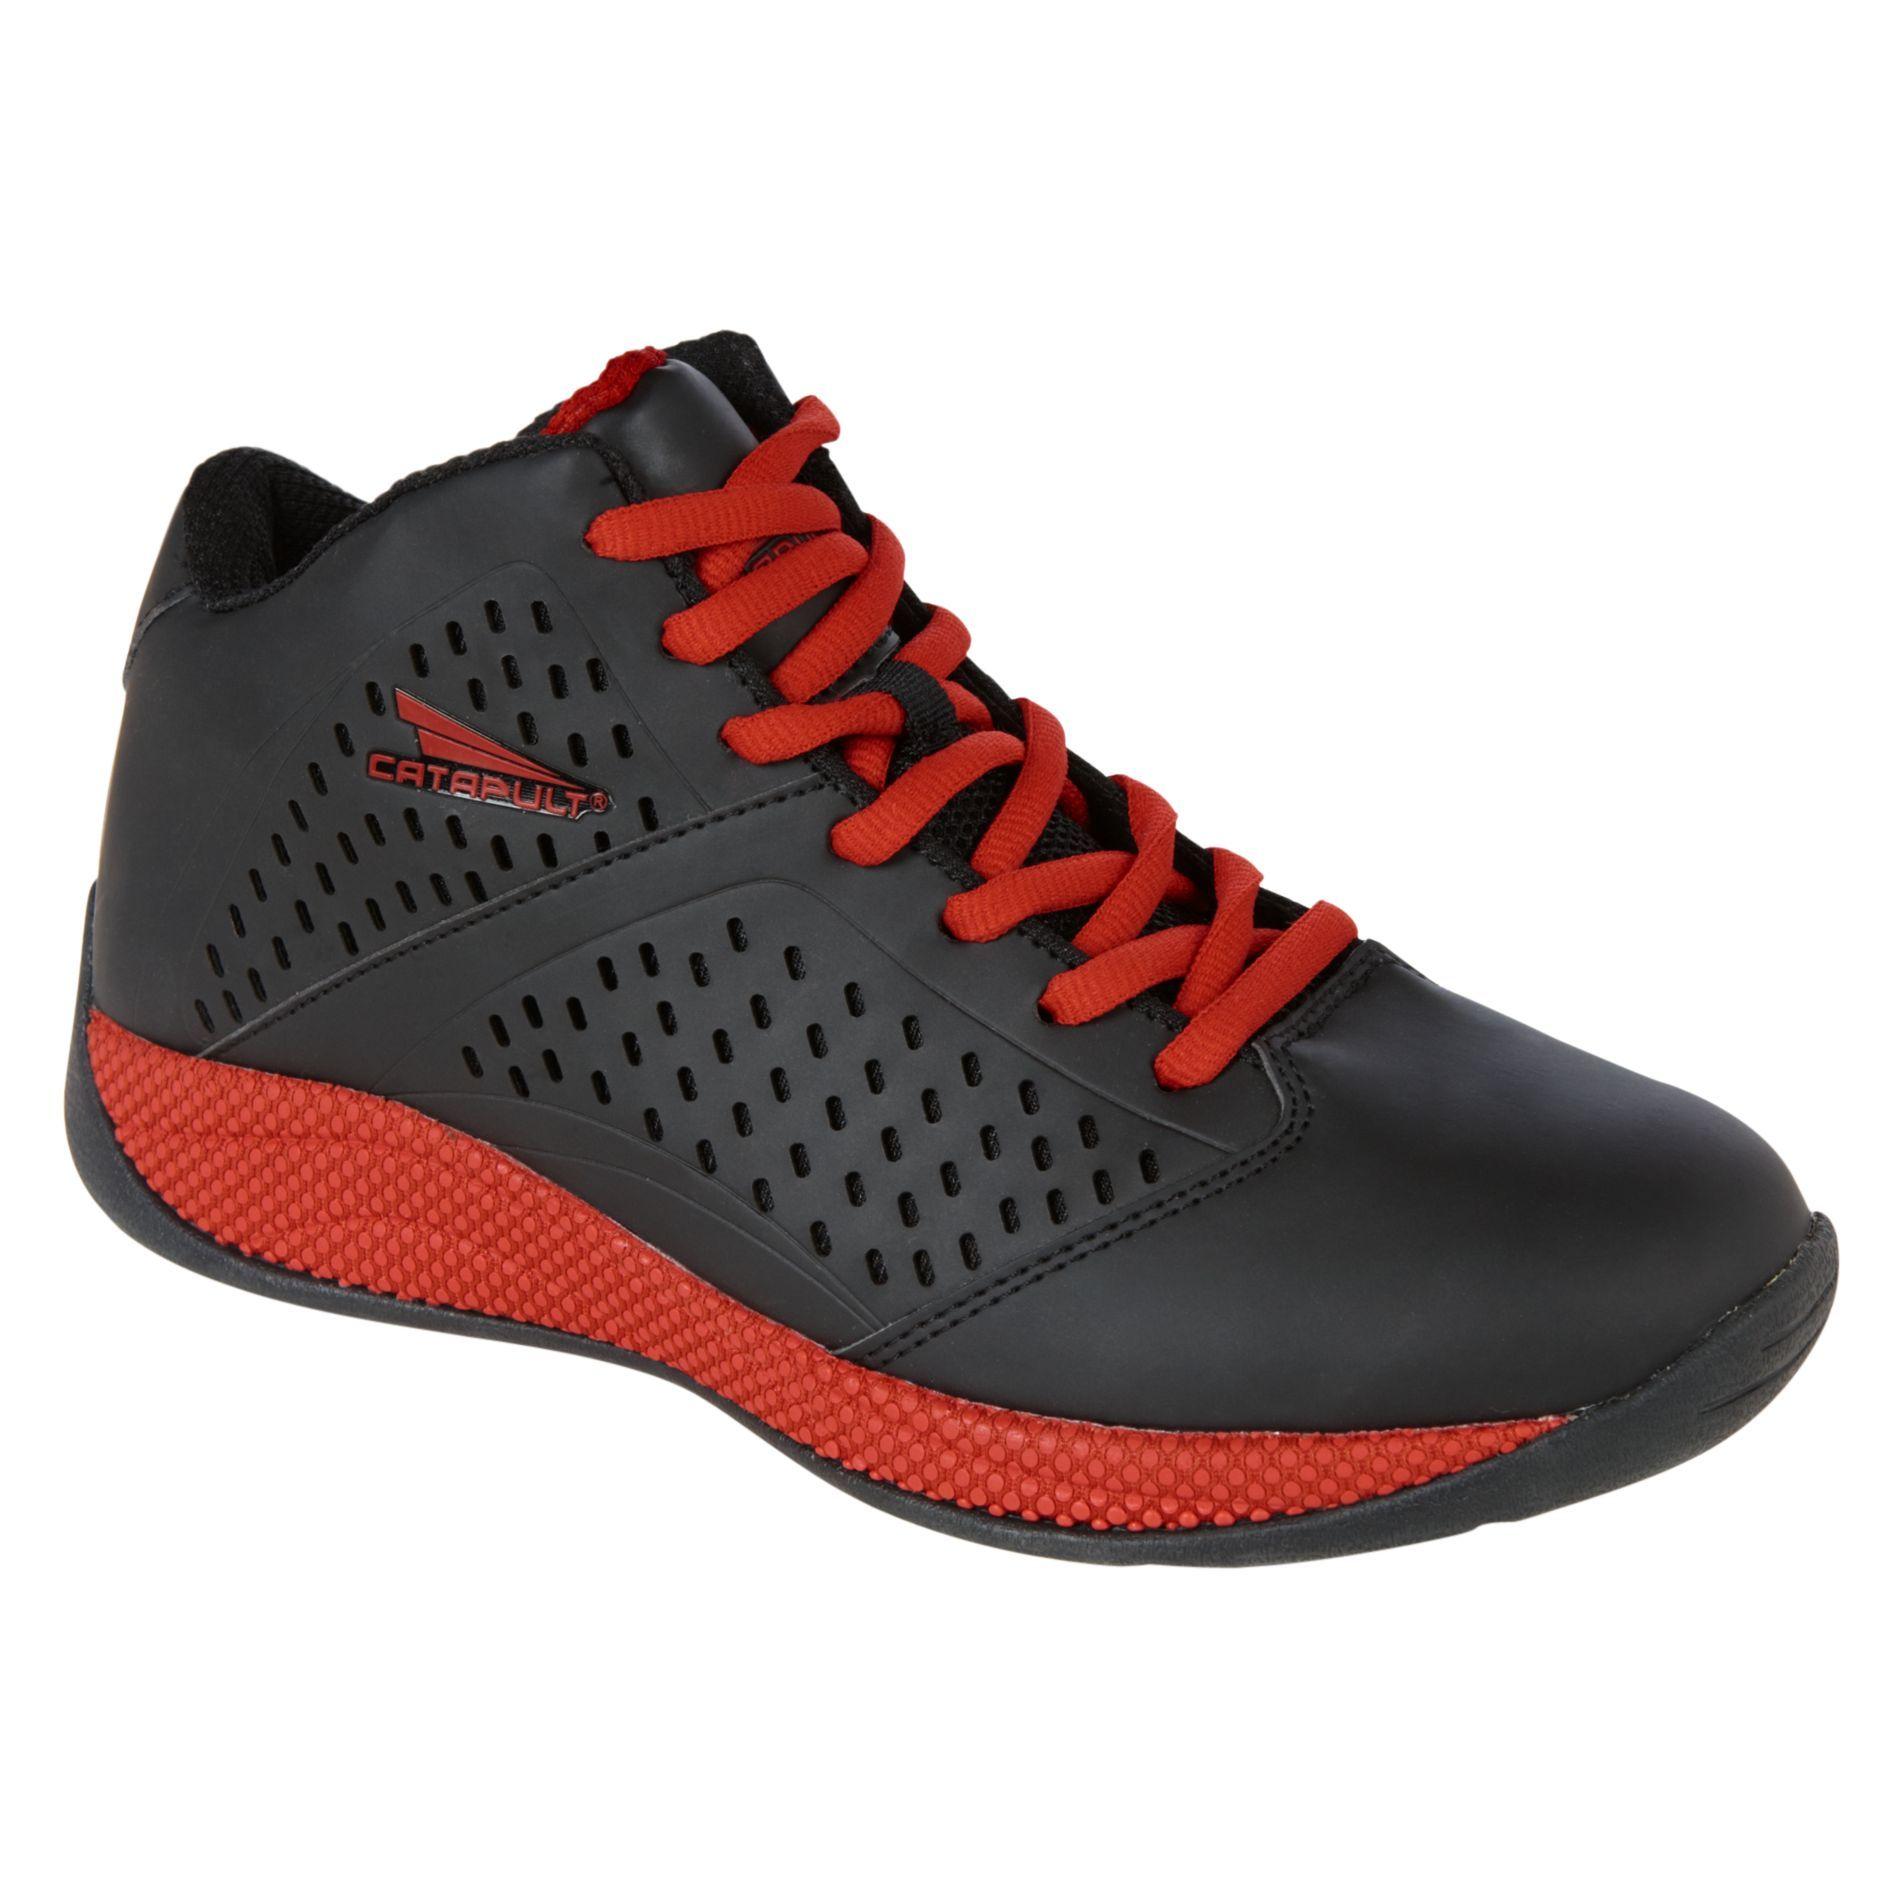 Men's Bounce Athletic Shoe - Black/Red